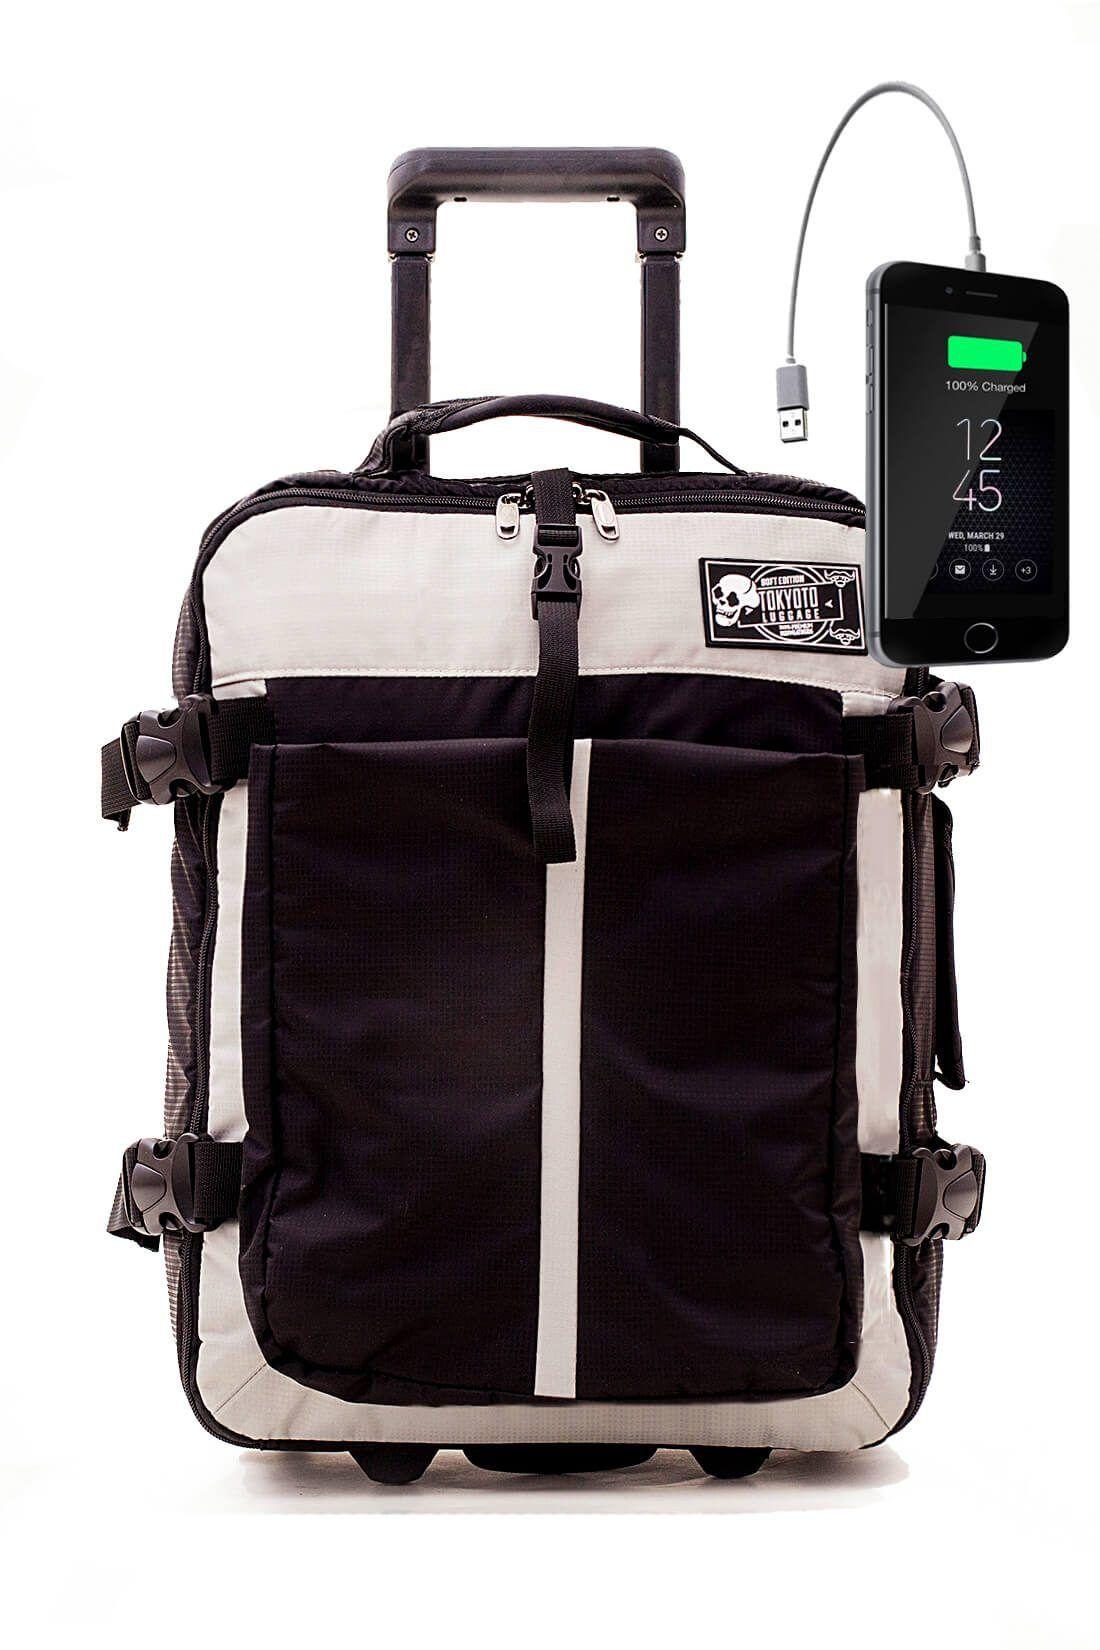 Nylon Kids Hand Trolley Cabin Luggage Suitcase Online Powerbank USB TOKYOTO SOFT BLACK